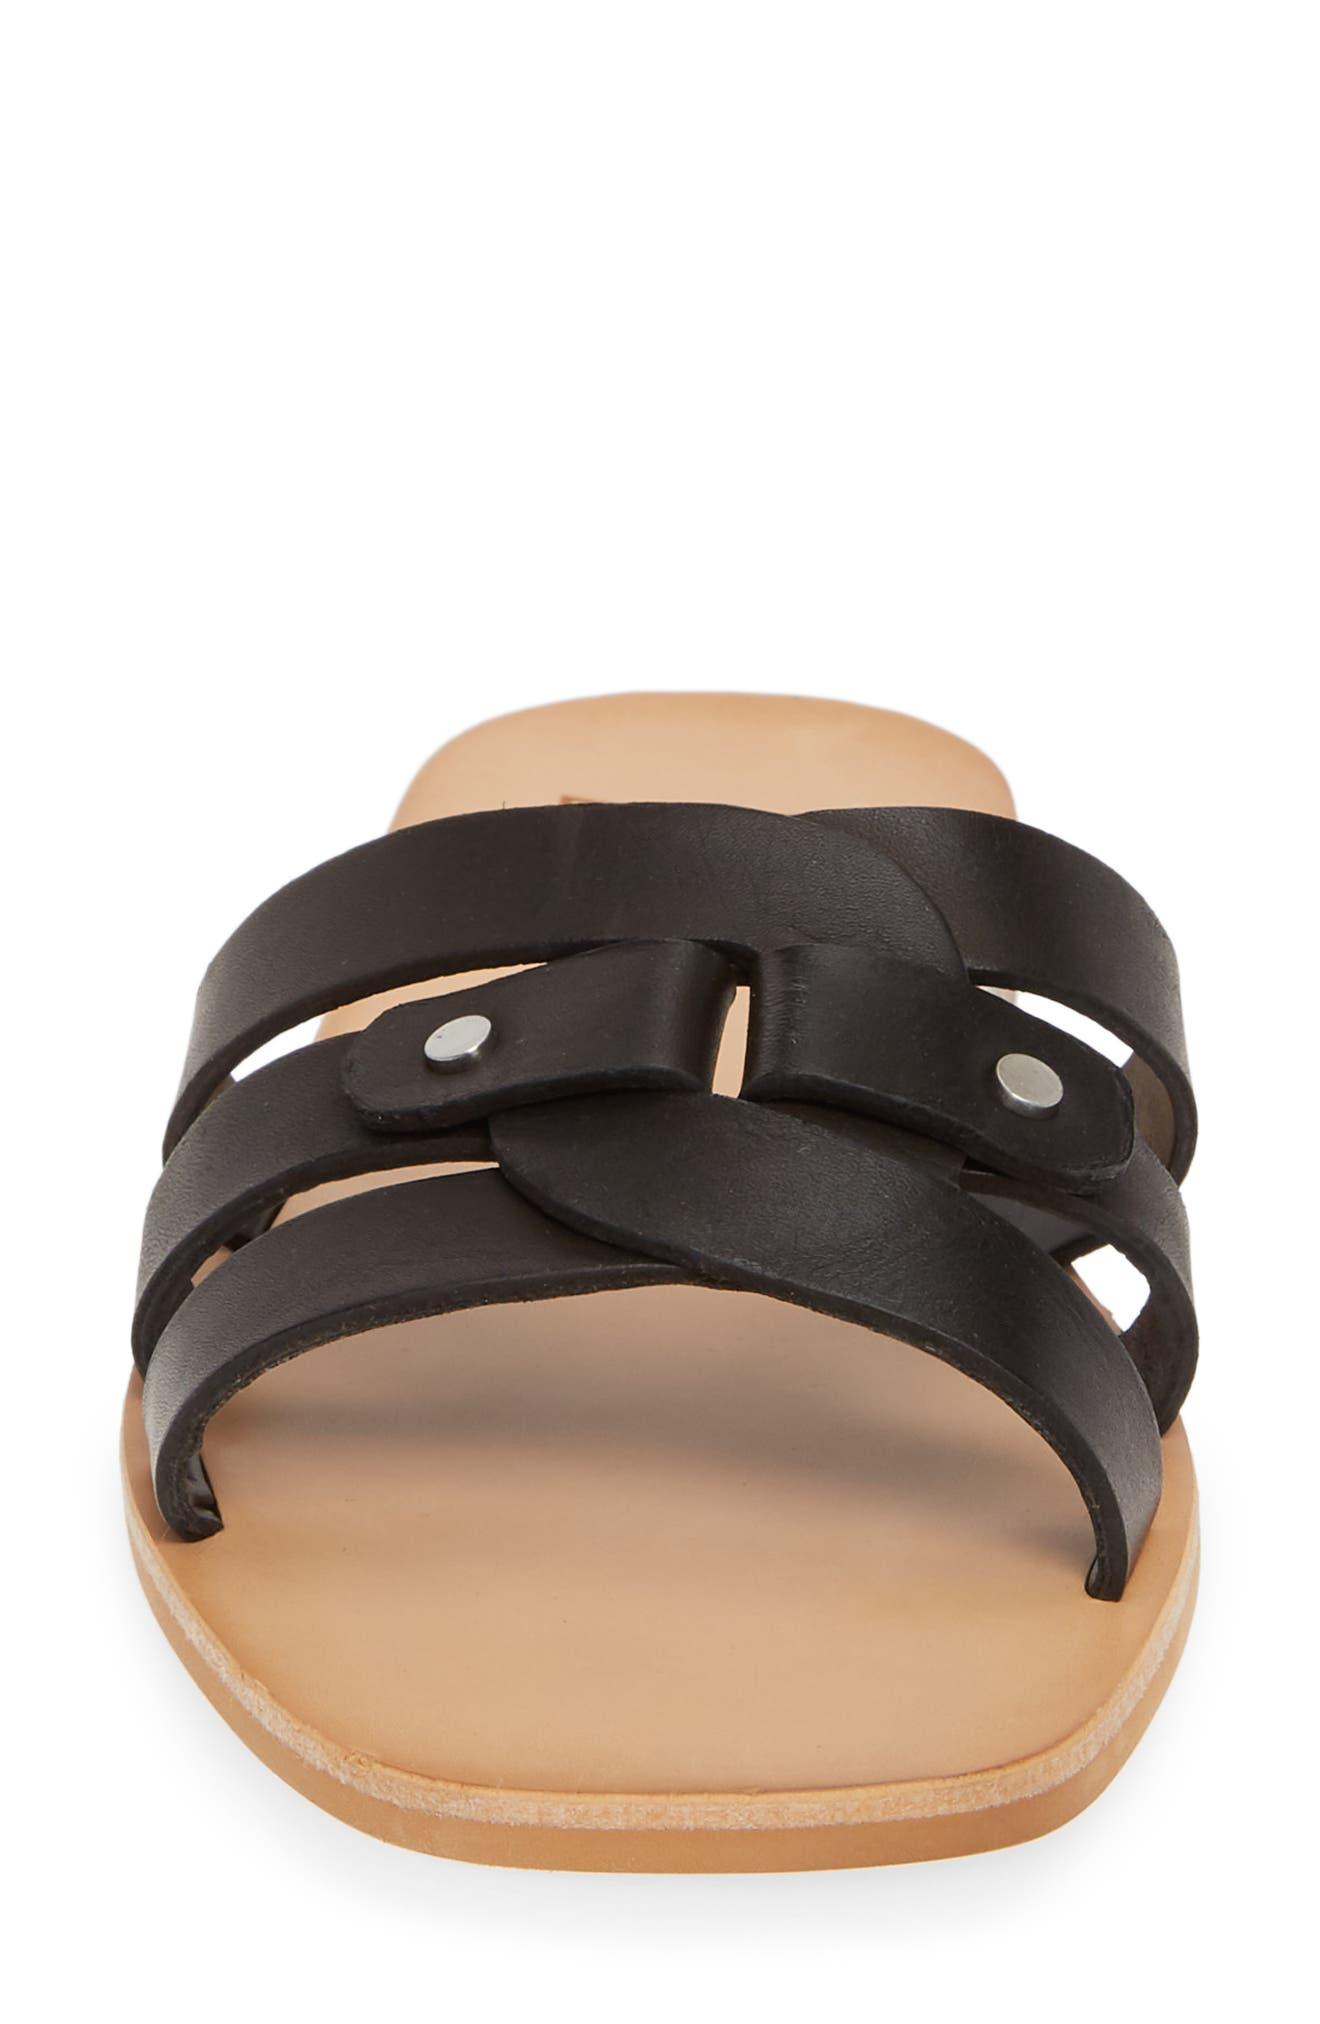 DOLCE VITA, Cait Slide Sandal, Alternate thumbnail 4, color, BLACK LEATHER